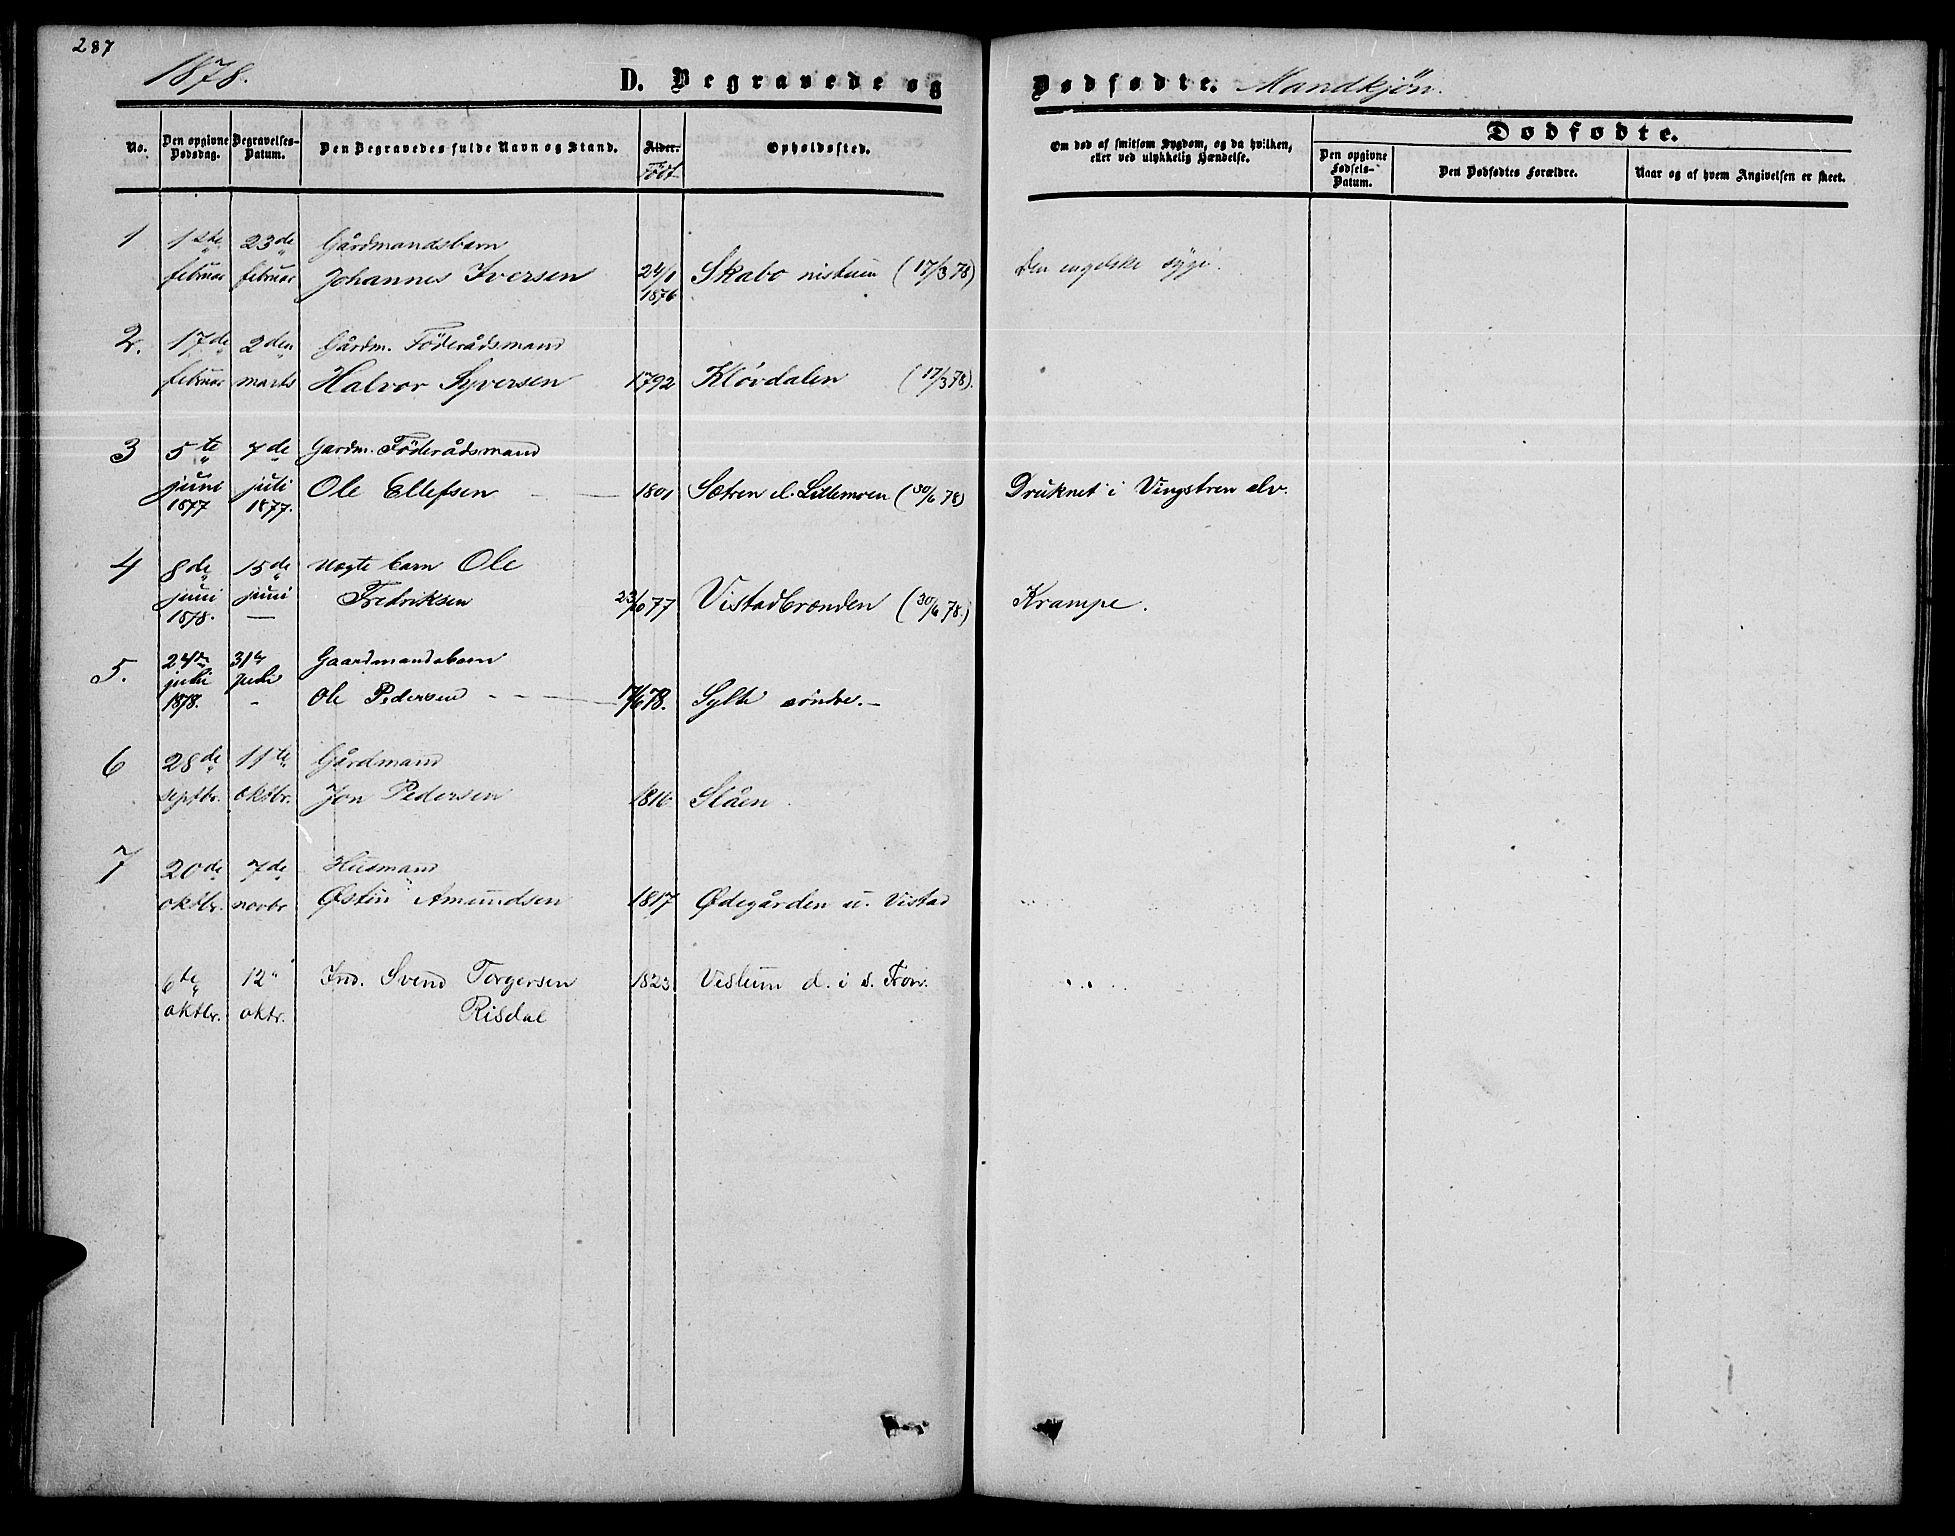 SAH, Nord-Fron prestekontor, Klokkerbok nr. 2, 1851-1883, s. 287